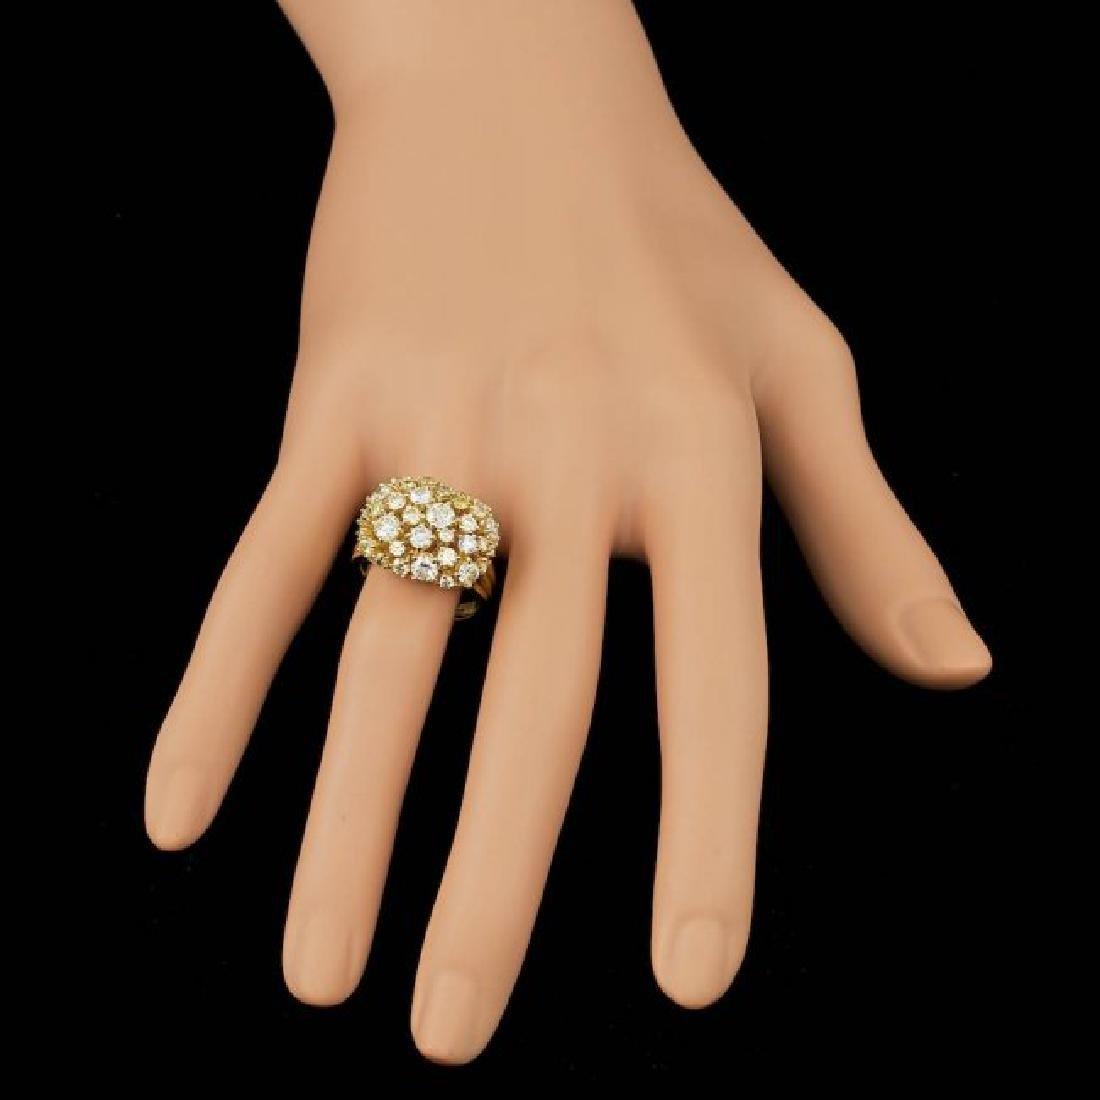 14k Yellow Gold 3.10ct Diamond Ring - 3